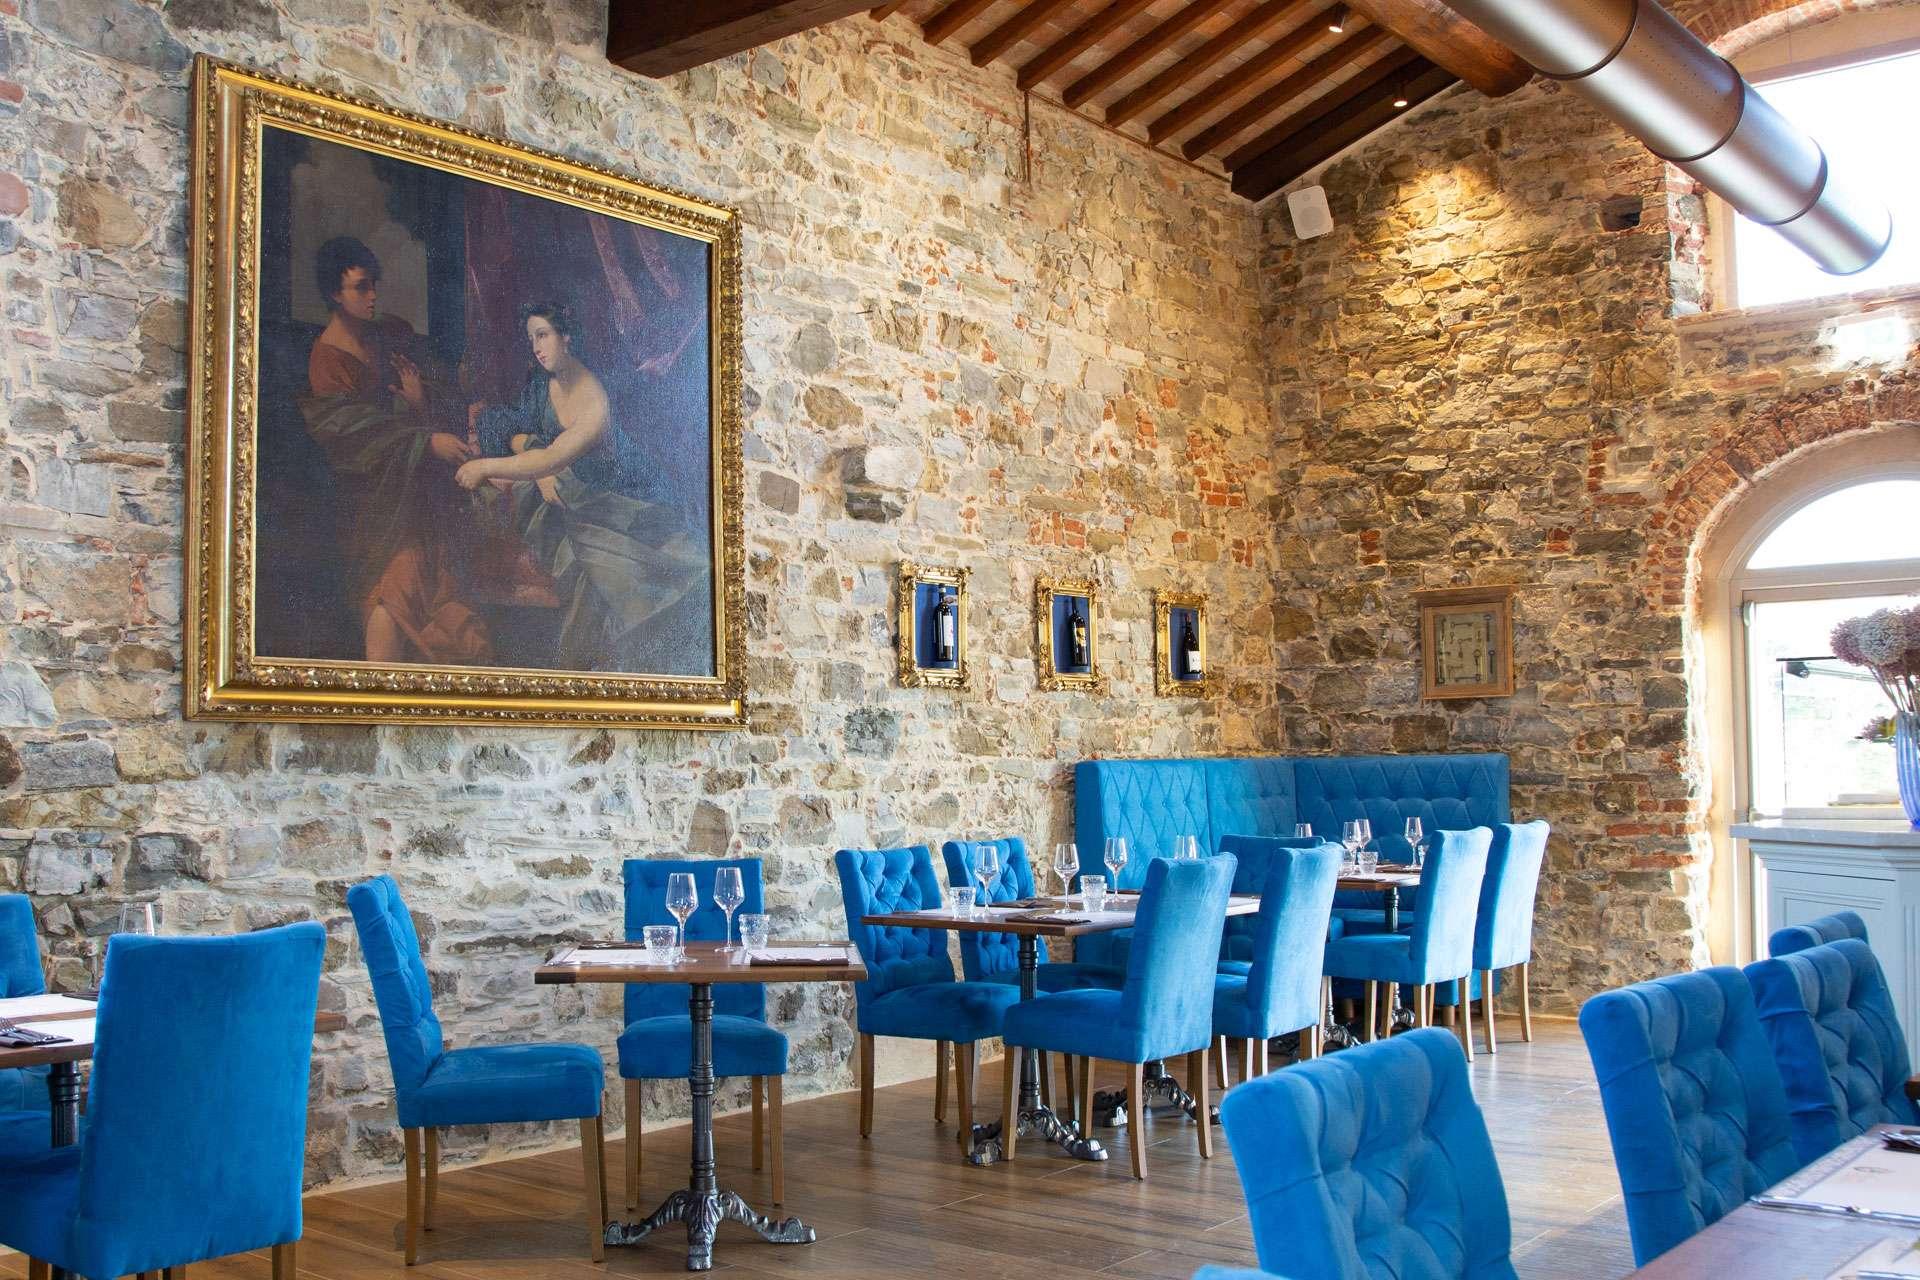 sala de La Fornace de' Medici, ristorante in Mugello